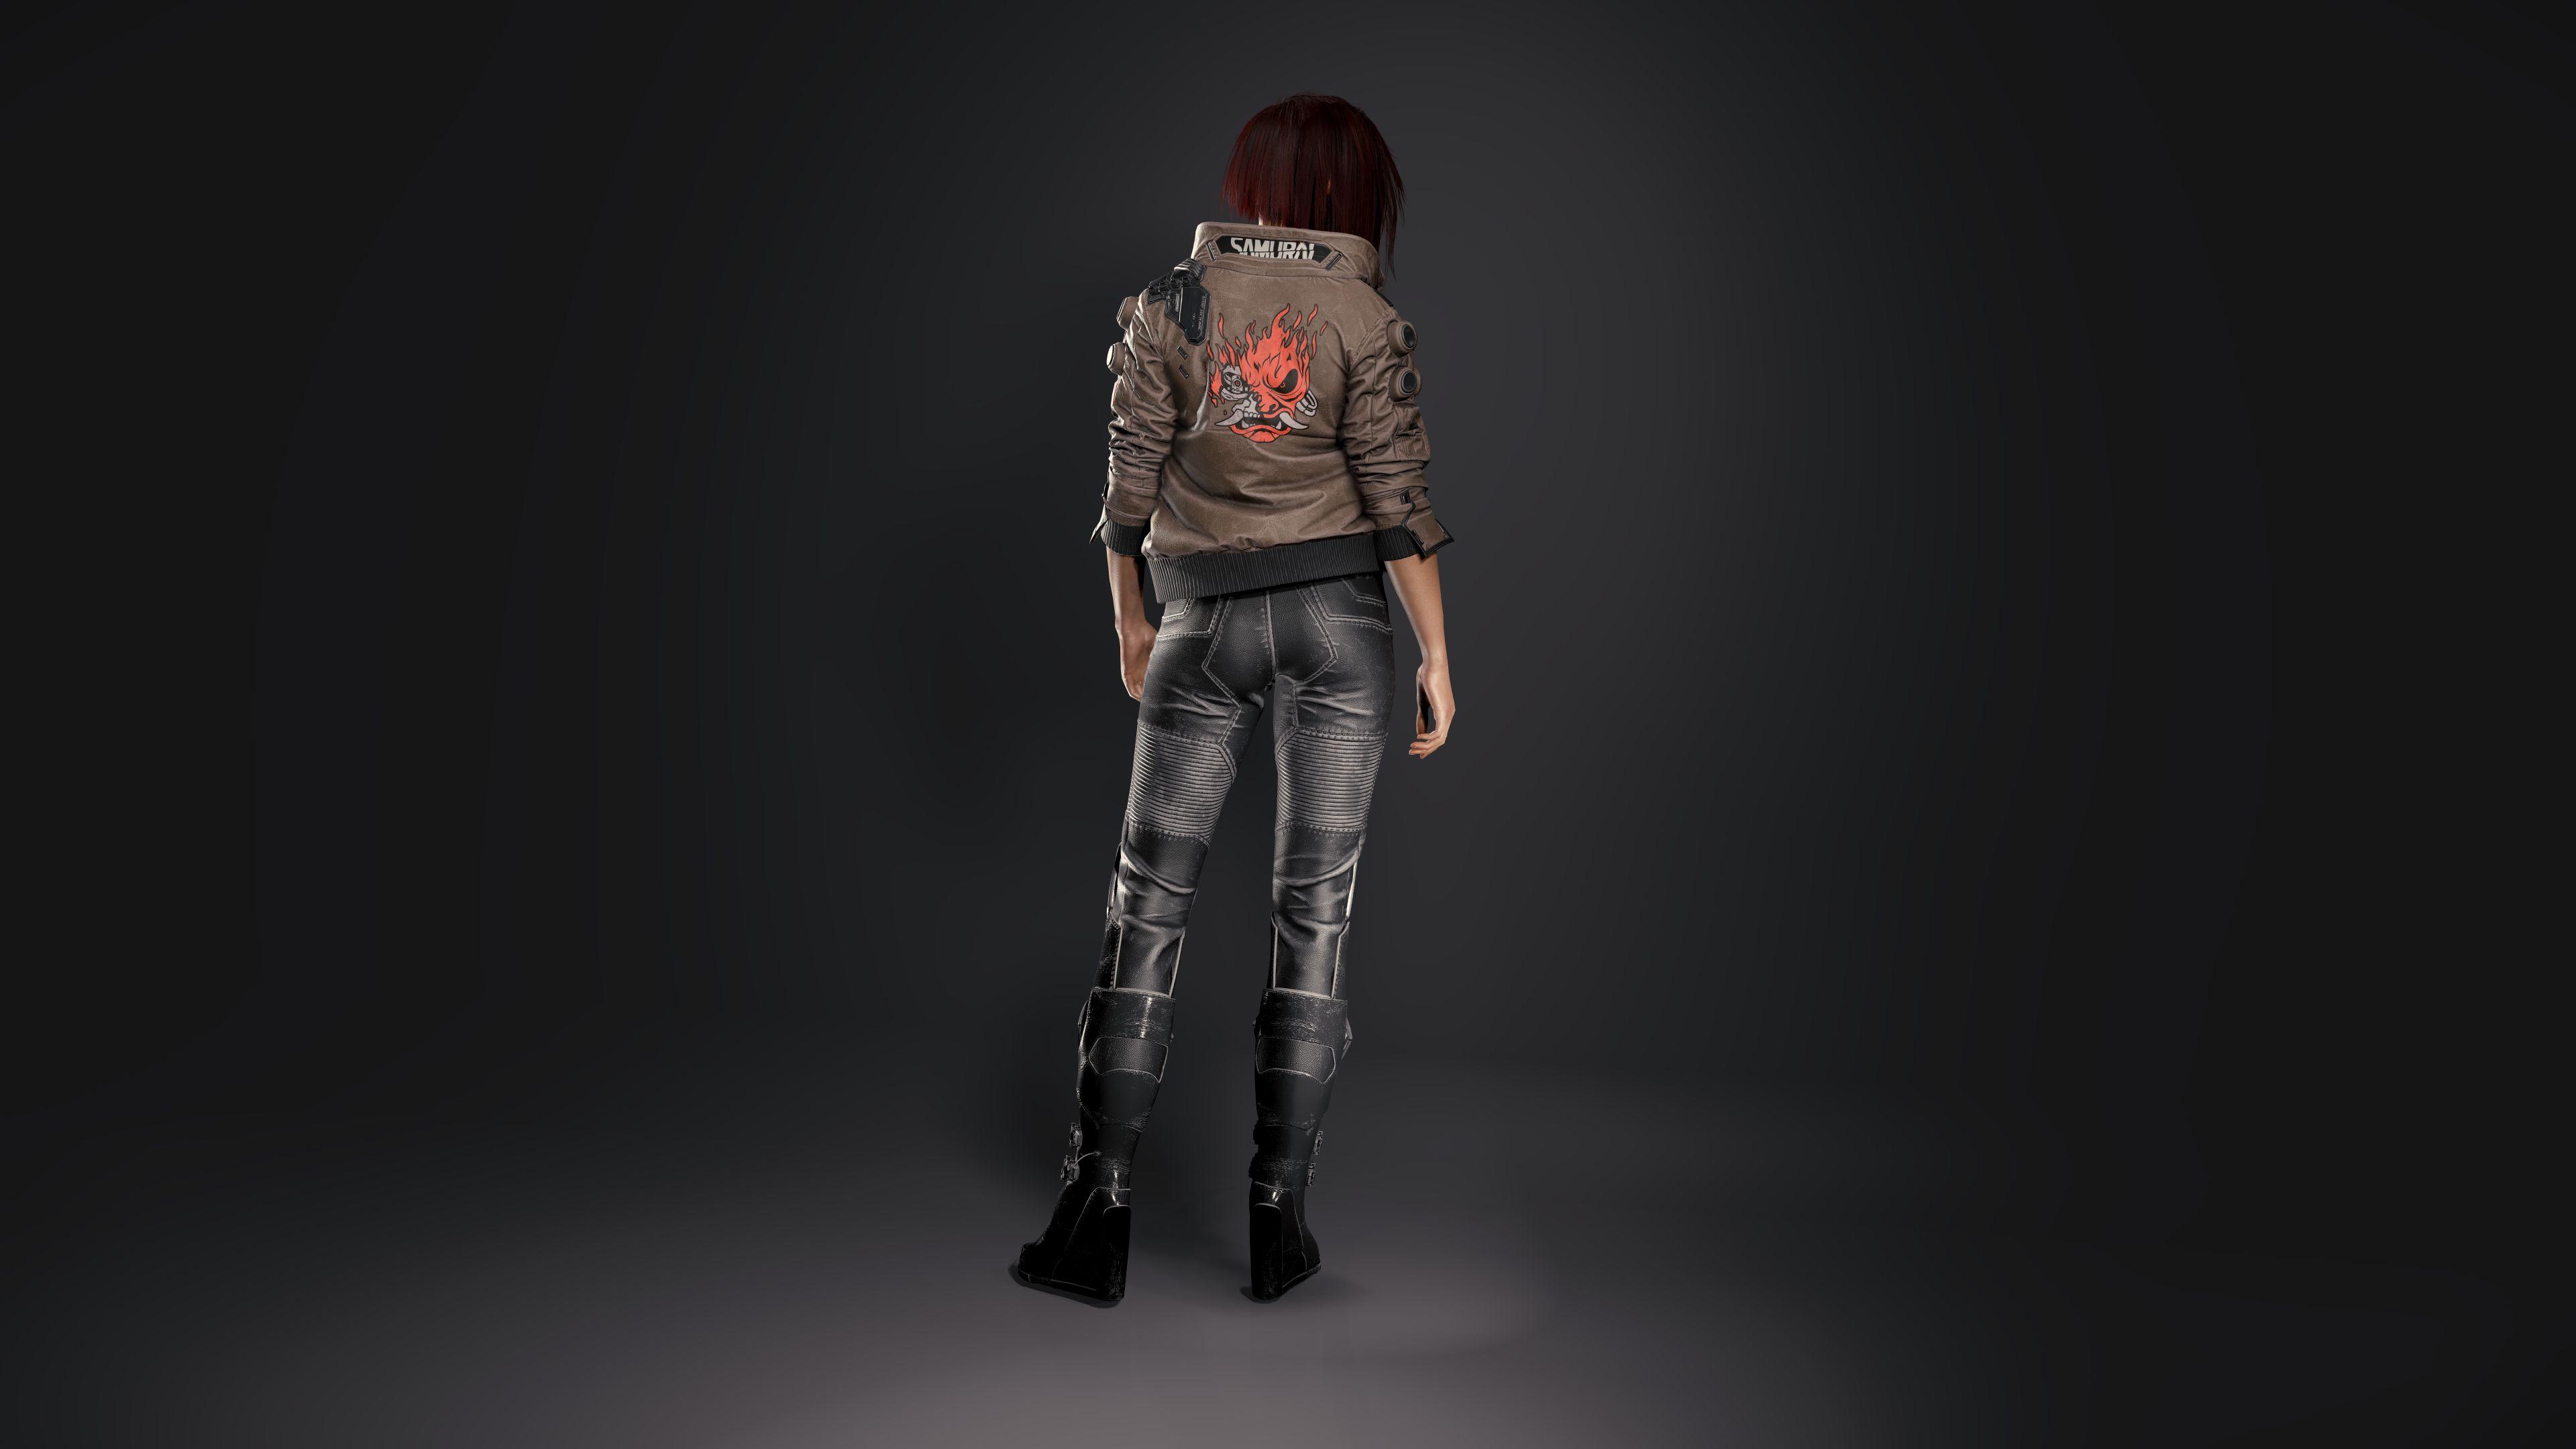 Рендер - Cyberpunk 2077